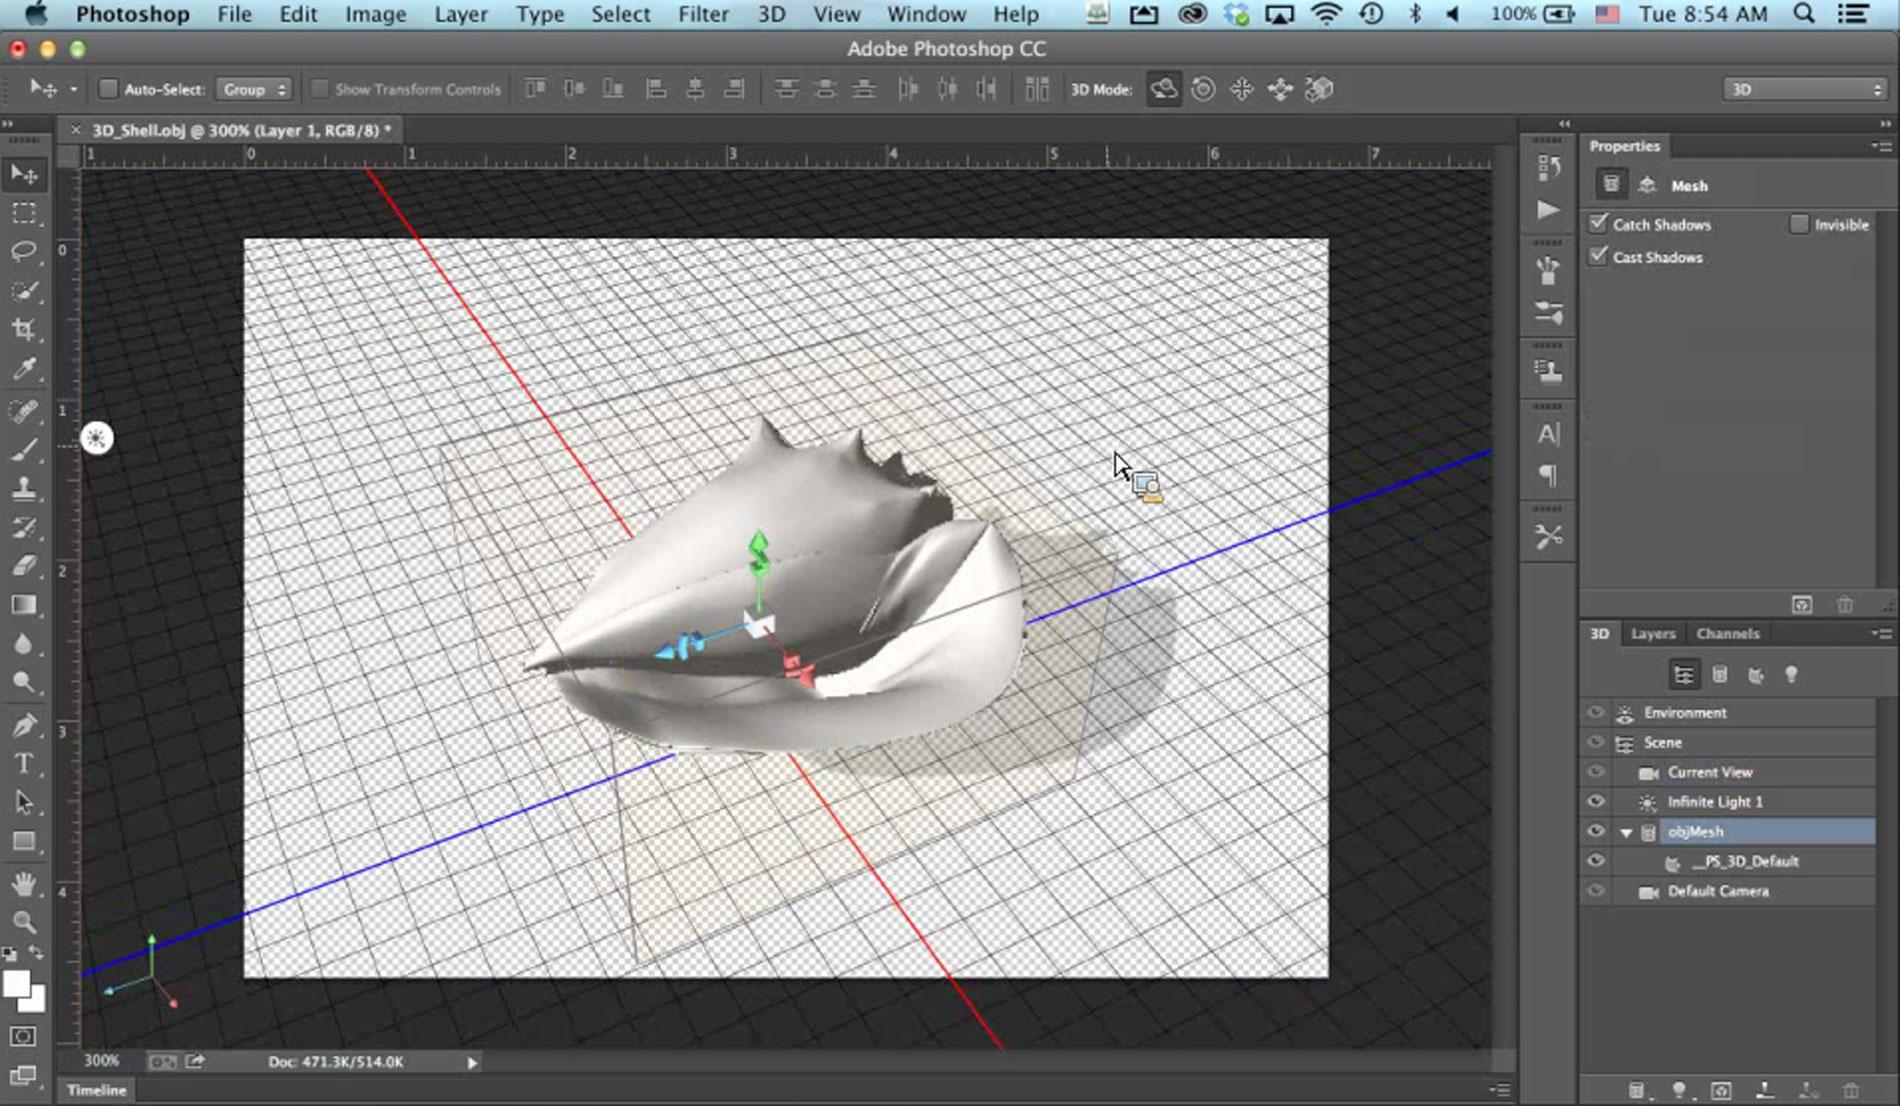 Adobe Photoshop CC 3D Printing